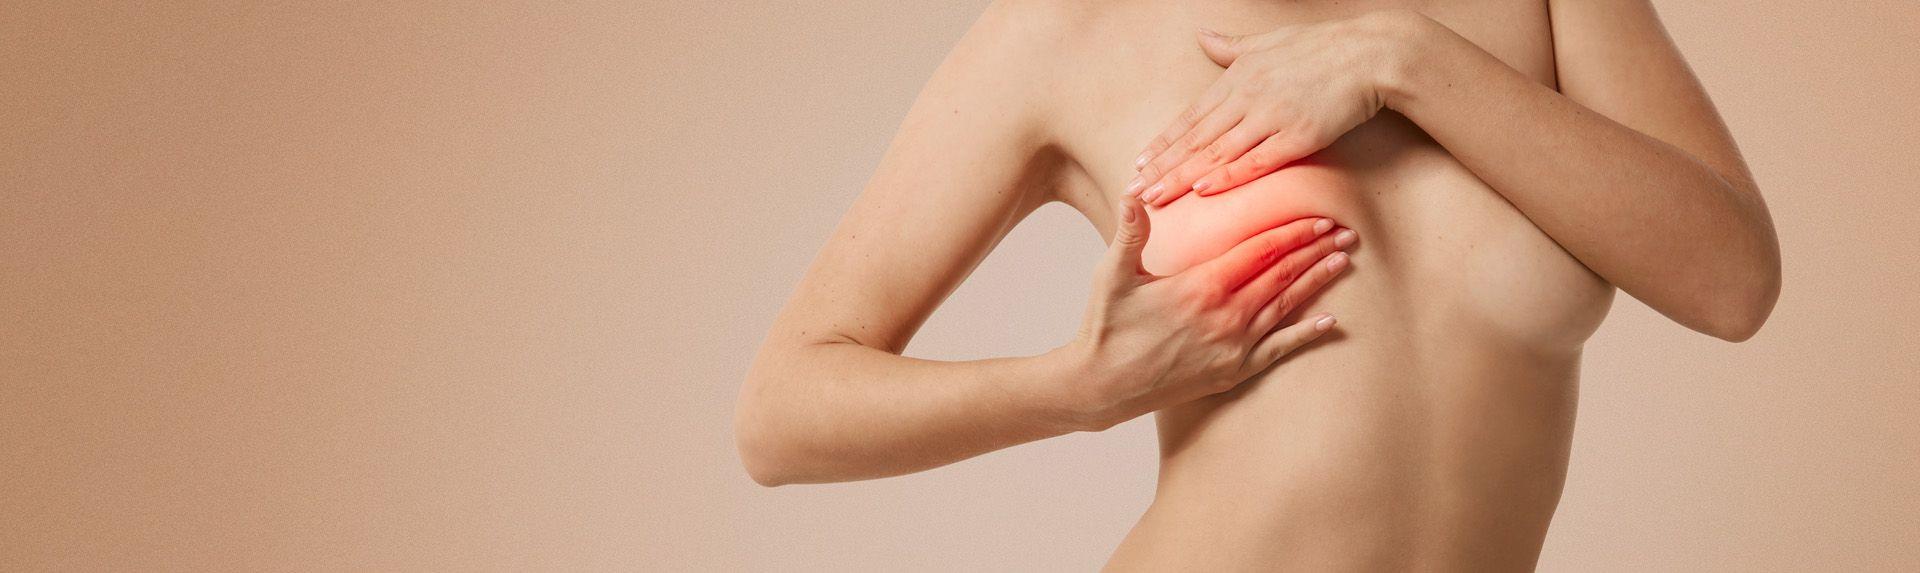 Почему при климаксе болят молочные железы